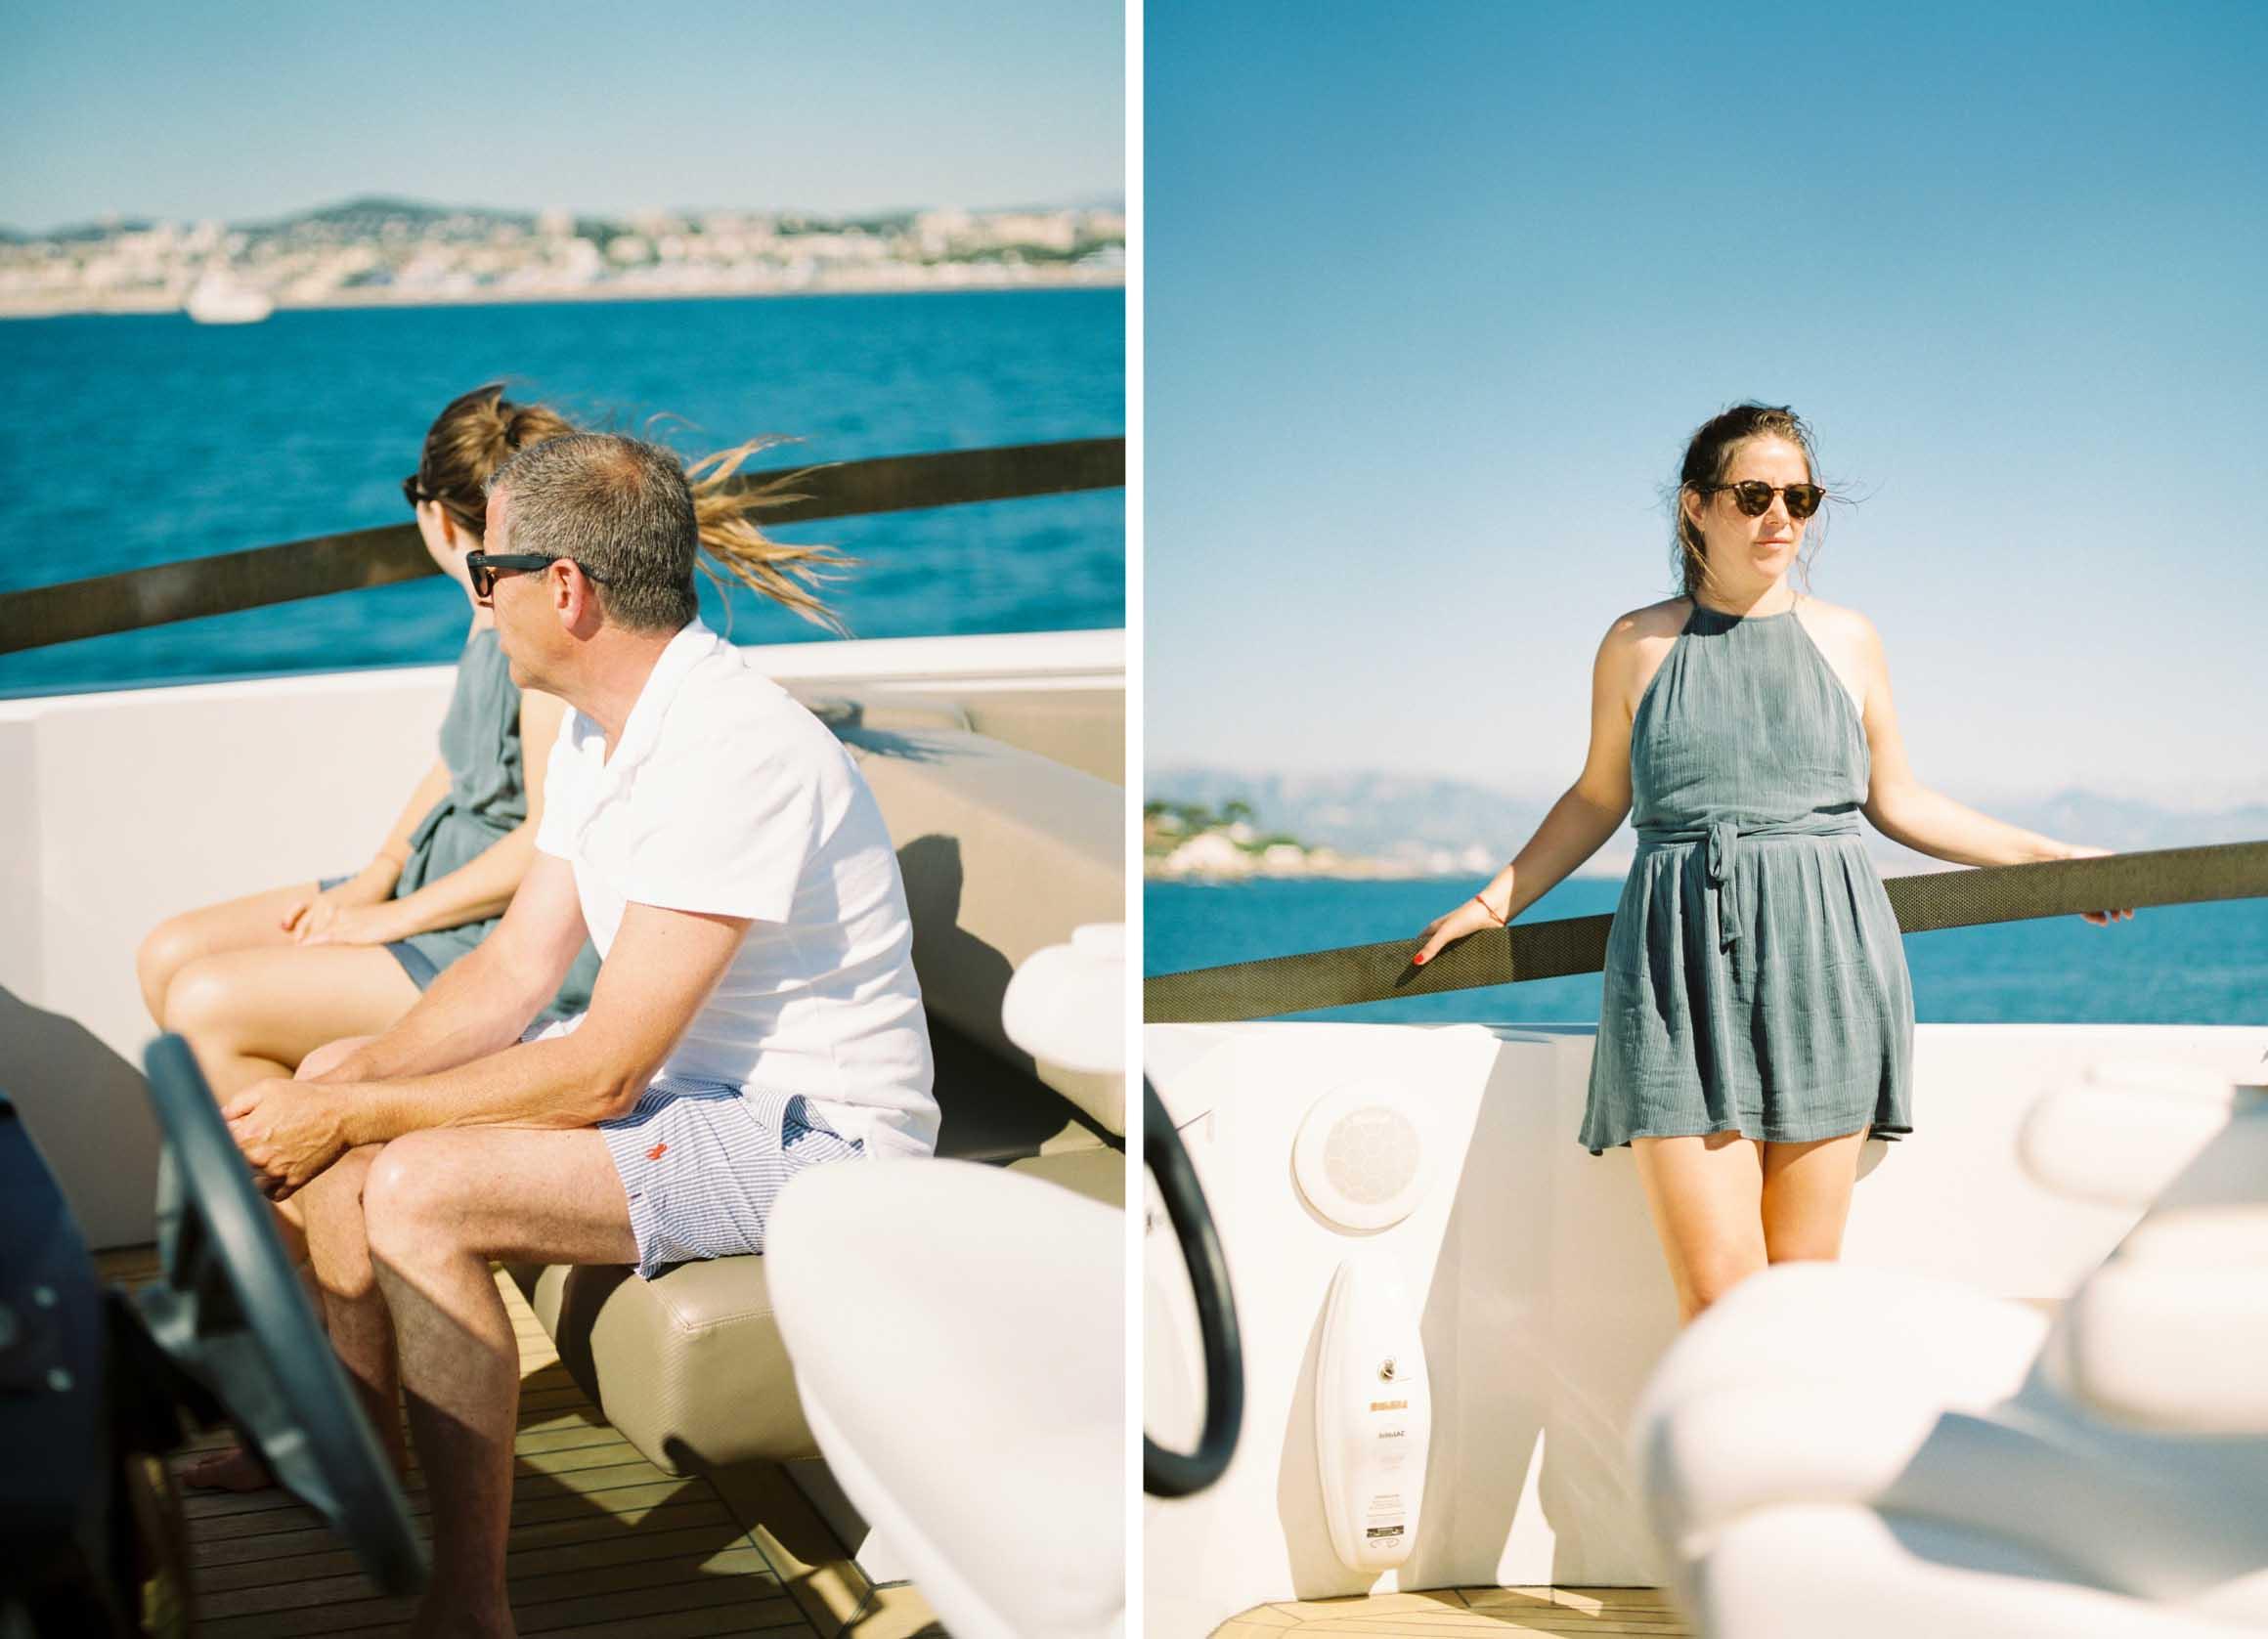 Amy O'Boyle Photography- Destination & UK Fine Art Film Wedding Photographer- South of France Hotel Du Cao Eden Roc St Tropez Yacht 2.jpg